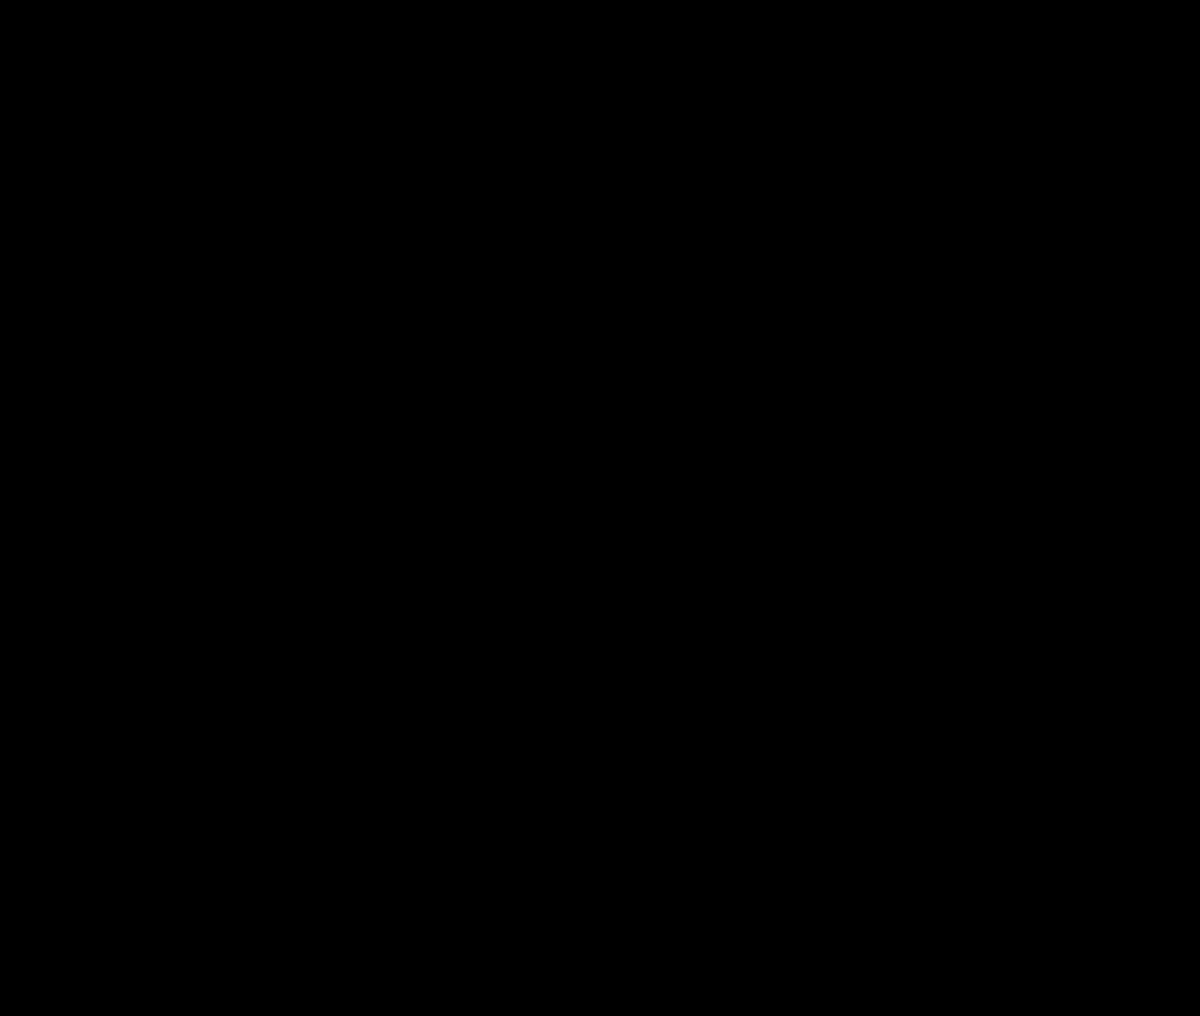 Ishikawa diagram wikipedia 02 business pinterest ishikawa ishikawa diagram wikipedia ccuart Images